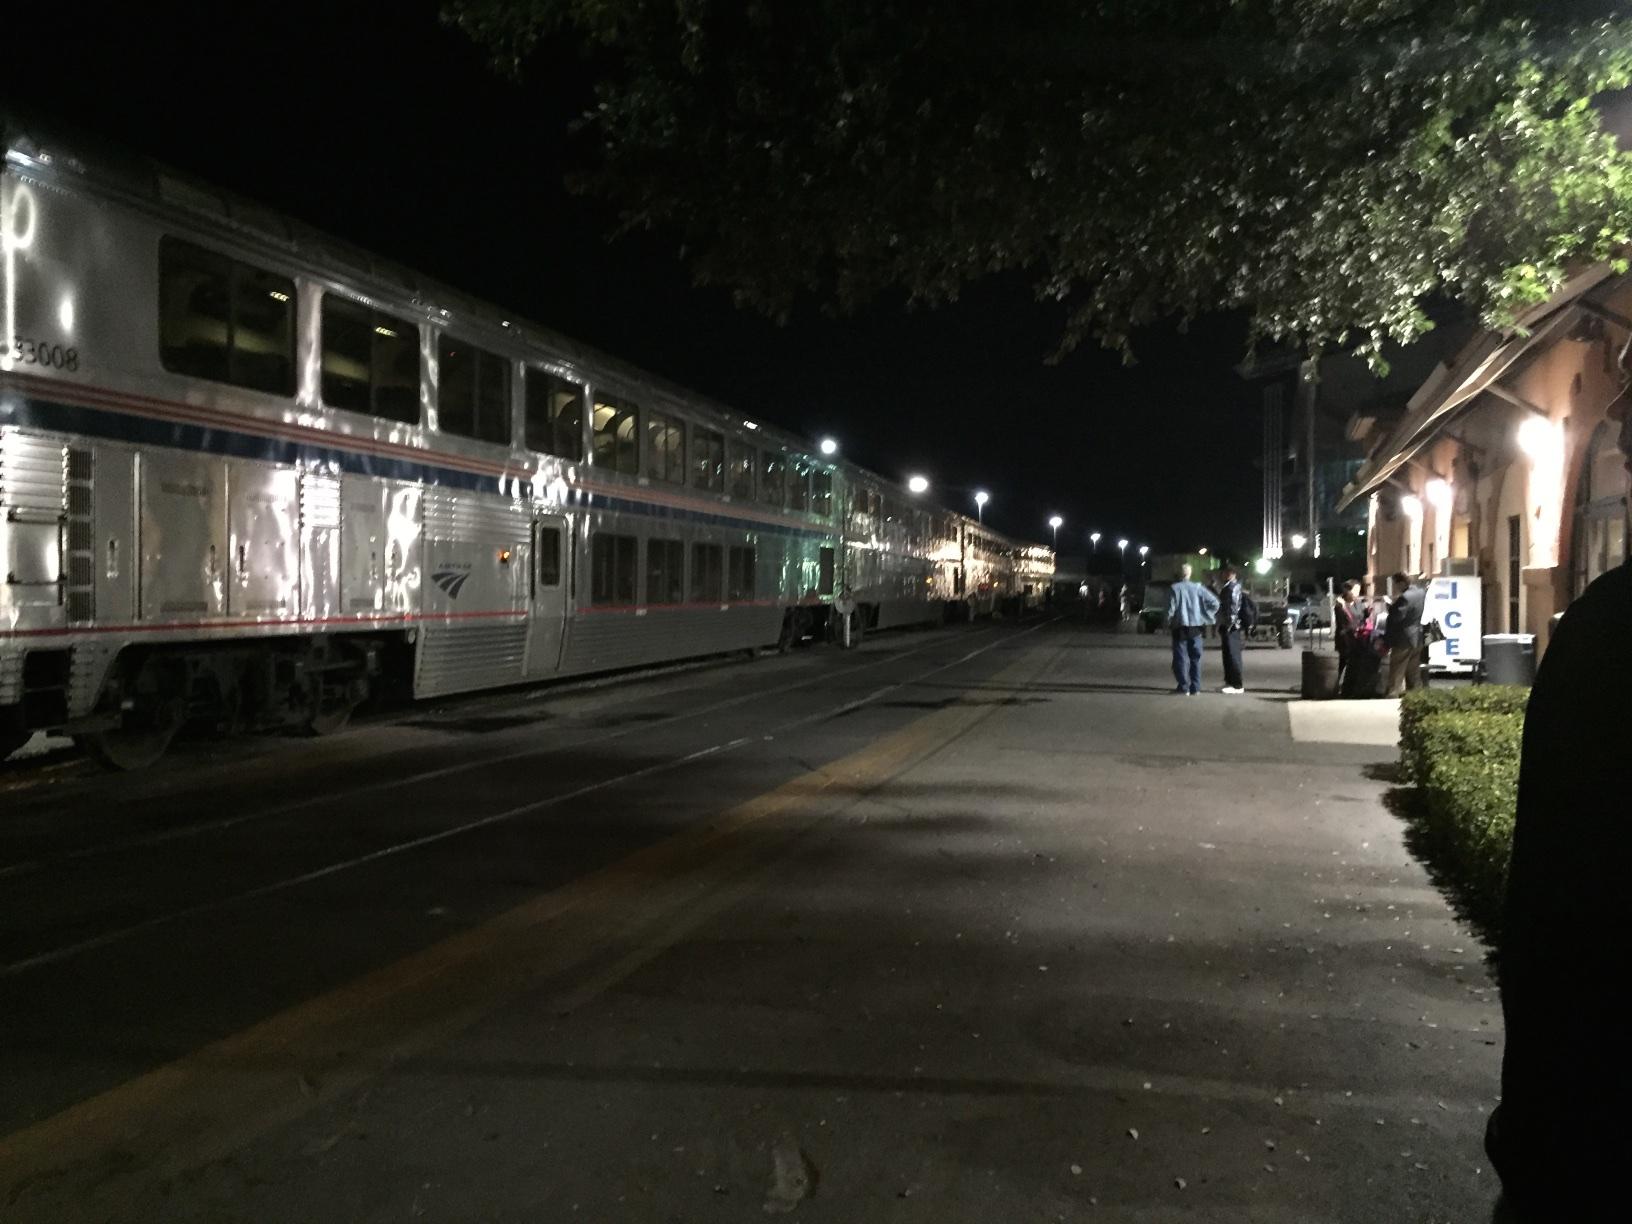 The San Antonio Amtrak station.